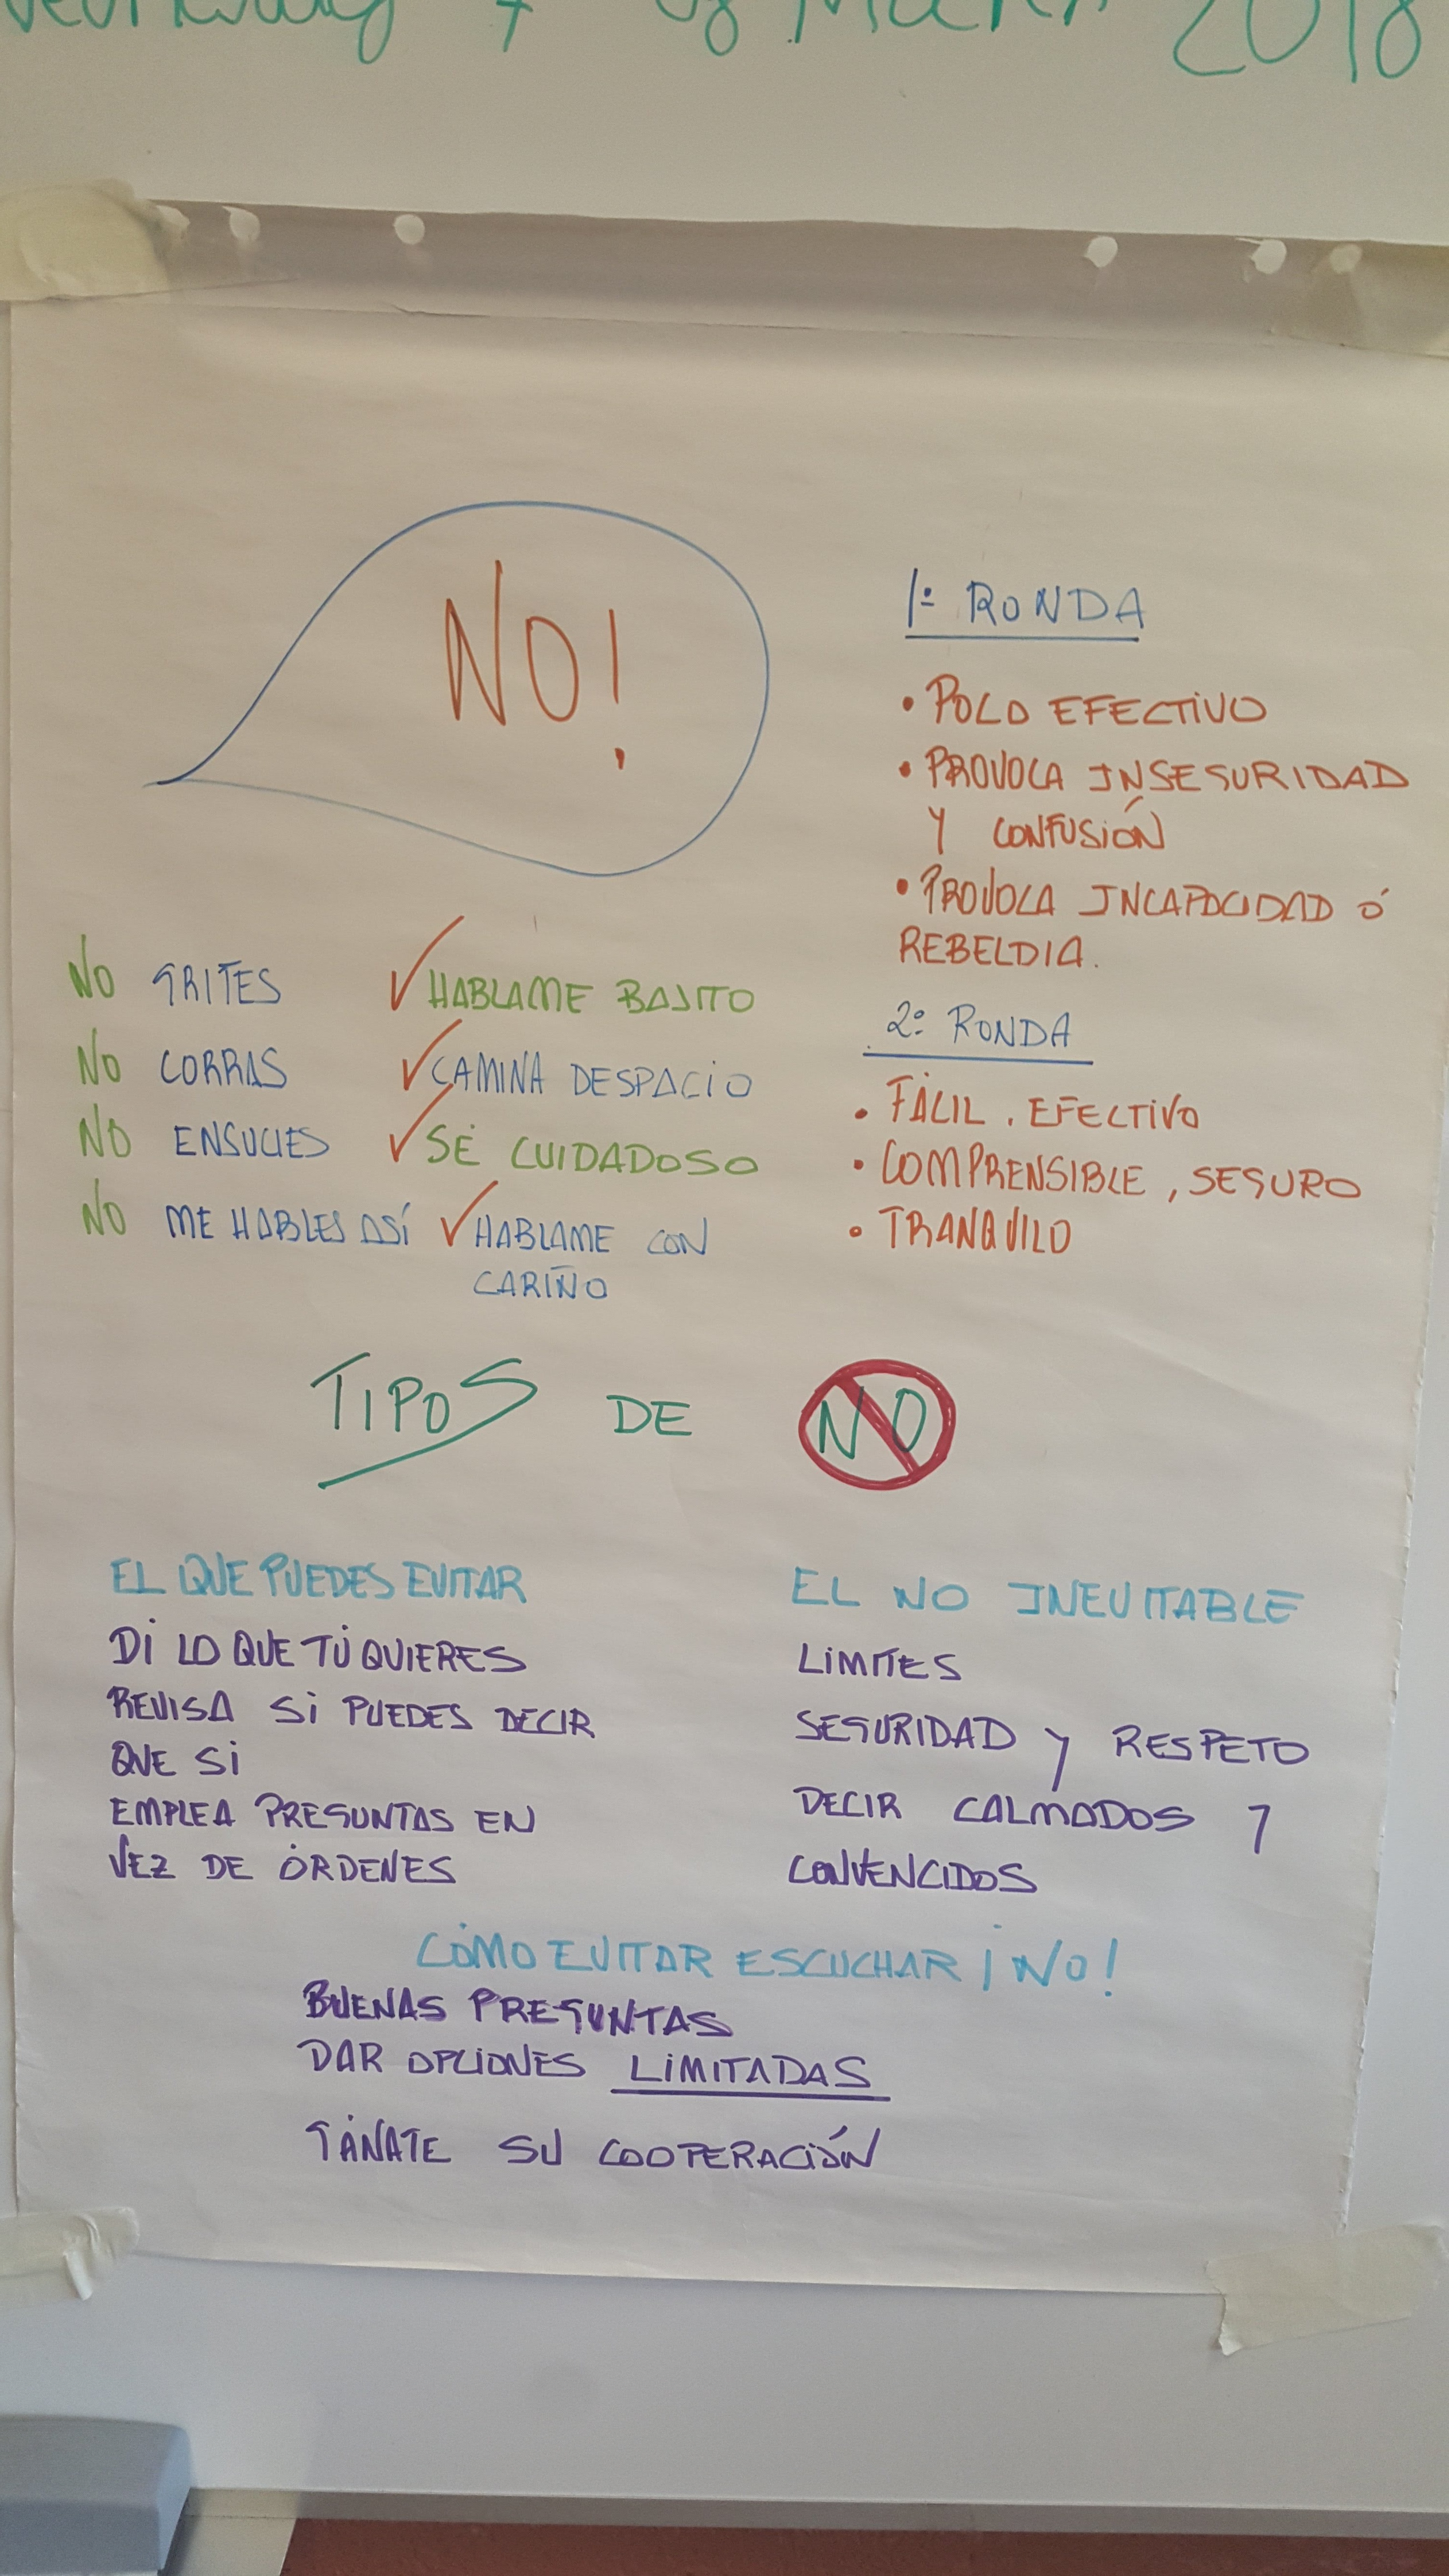 Imagen Formación Disciplina Positiva 15